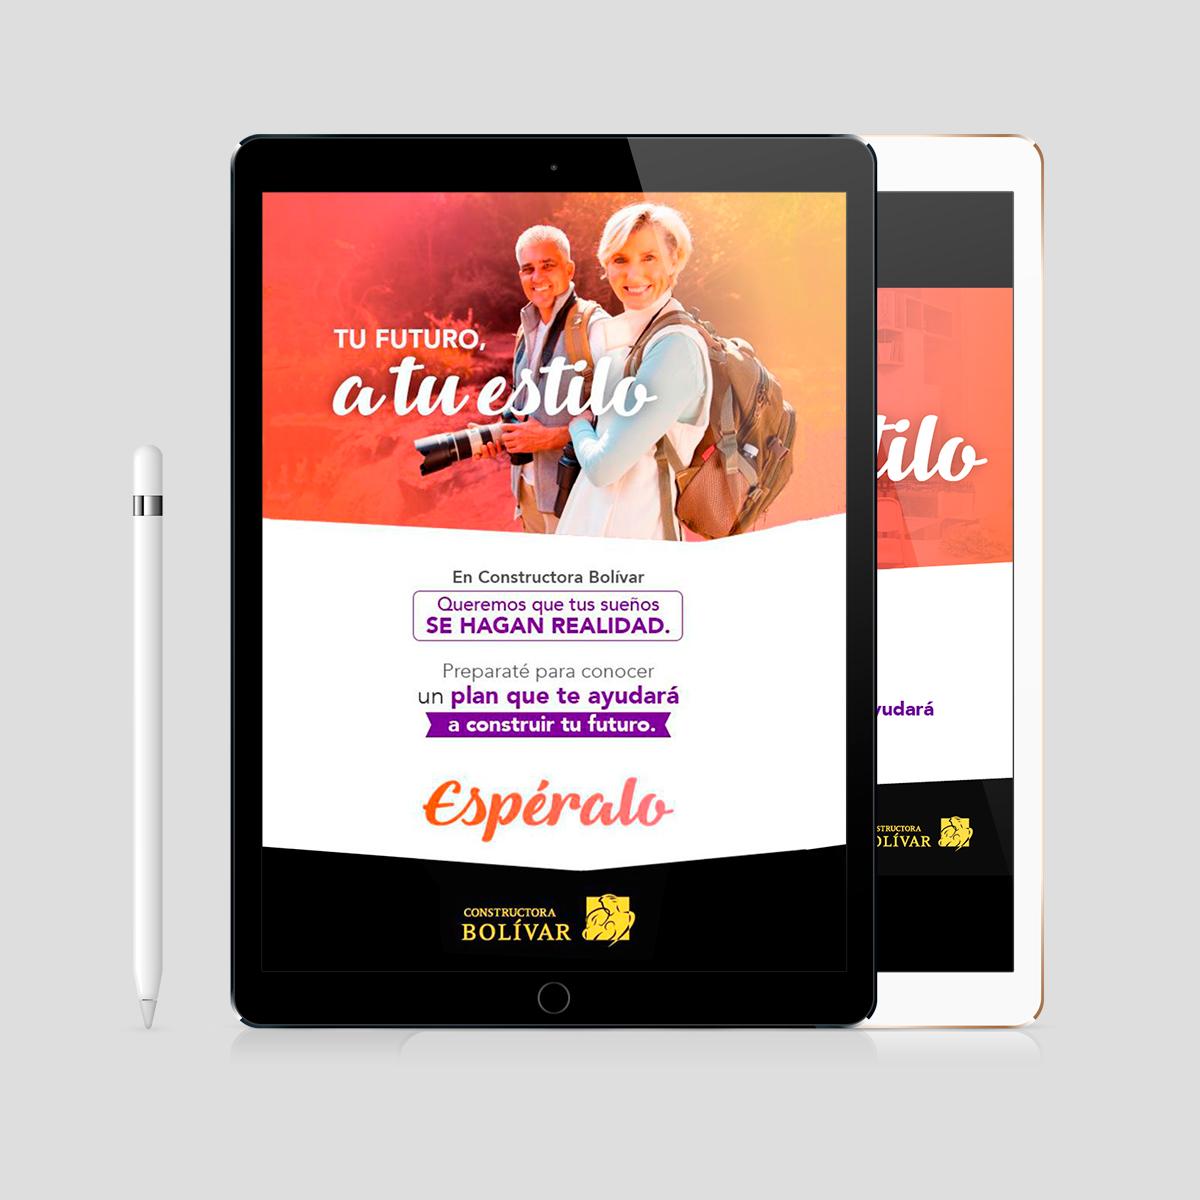 Campaña comunicación prepensionados Constructora Bolivar Imaginario